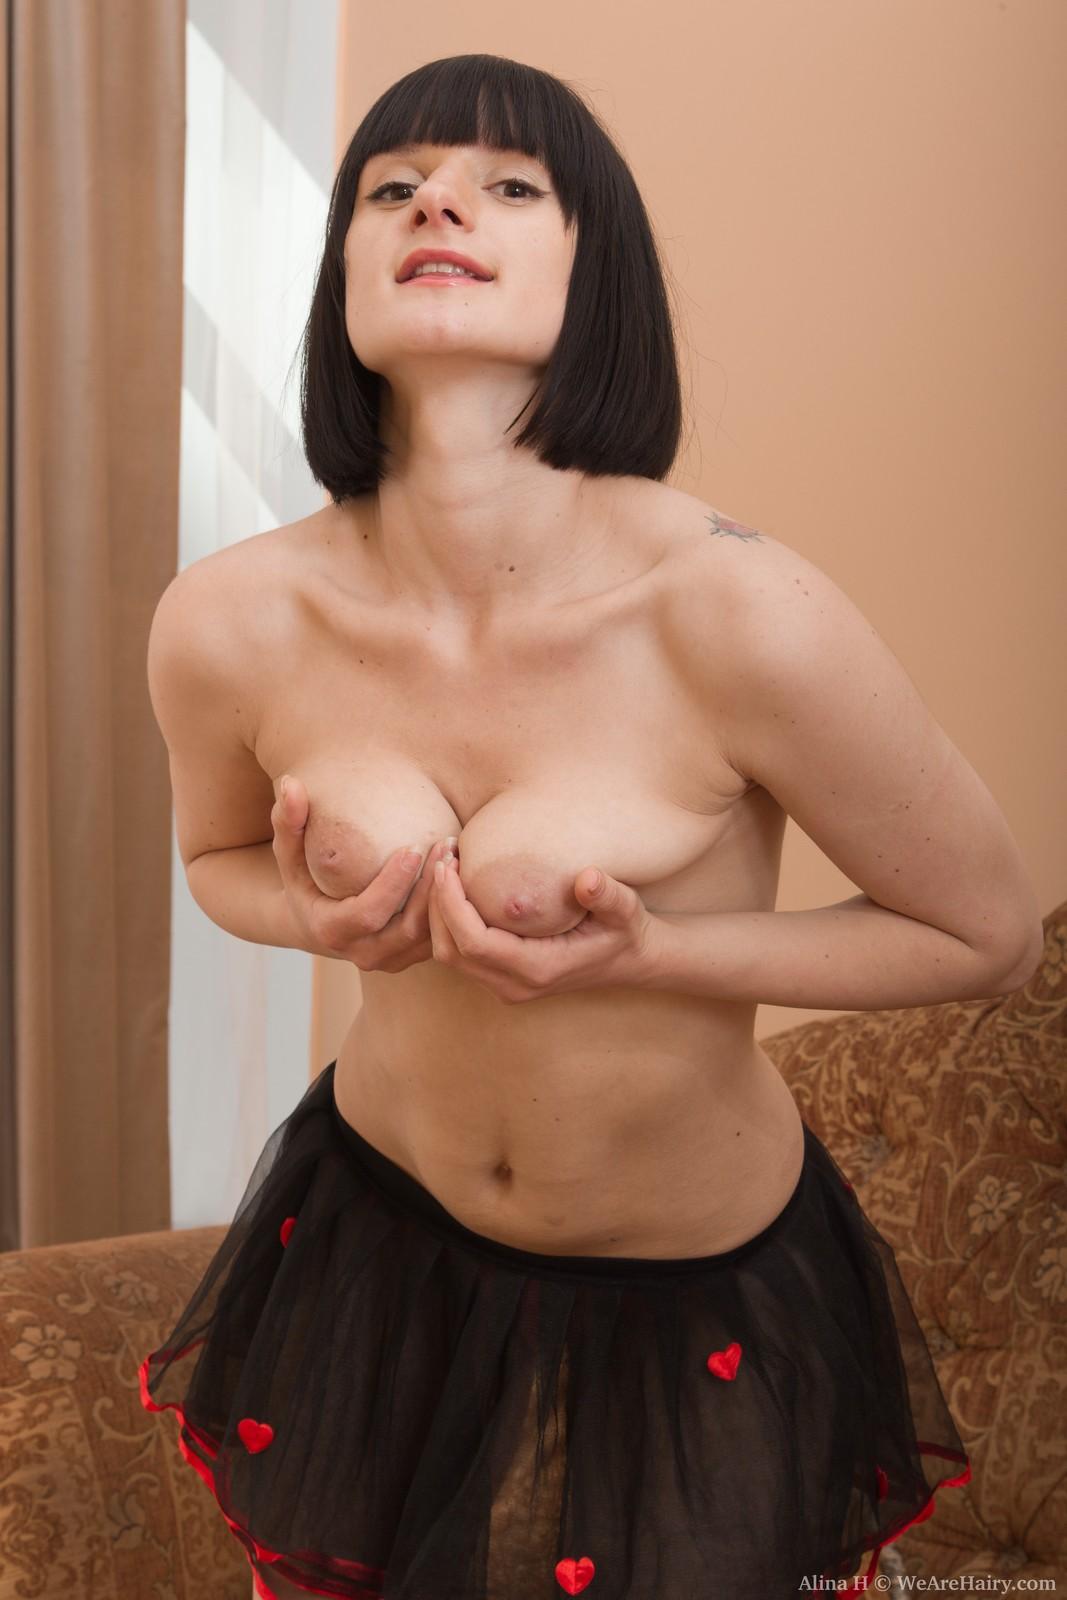 wpid-alina-h-puts-on-sexy-strip-show-on-her-sofa5.jpg